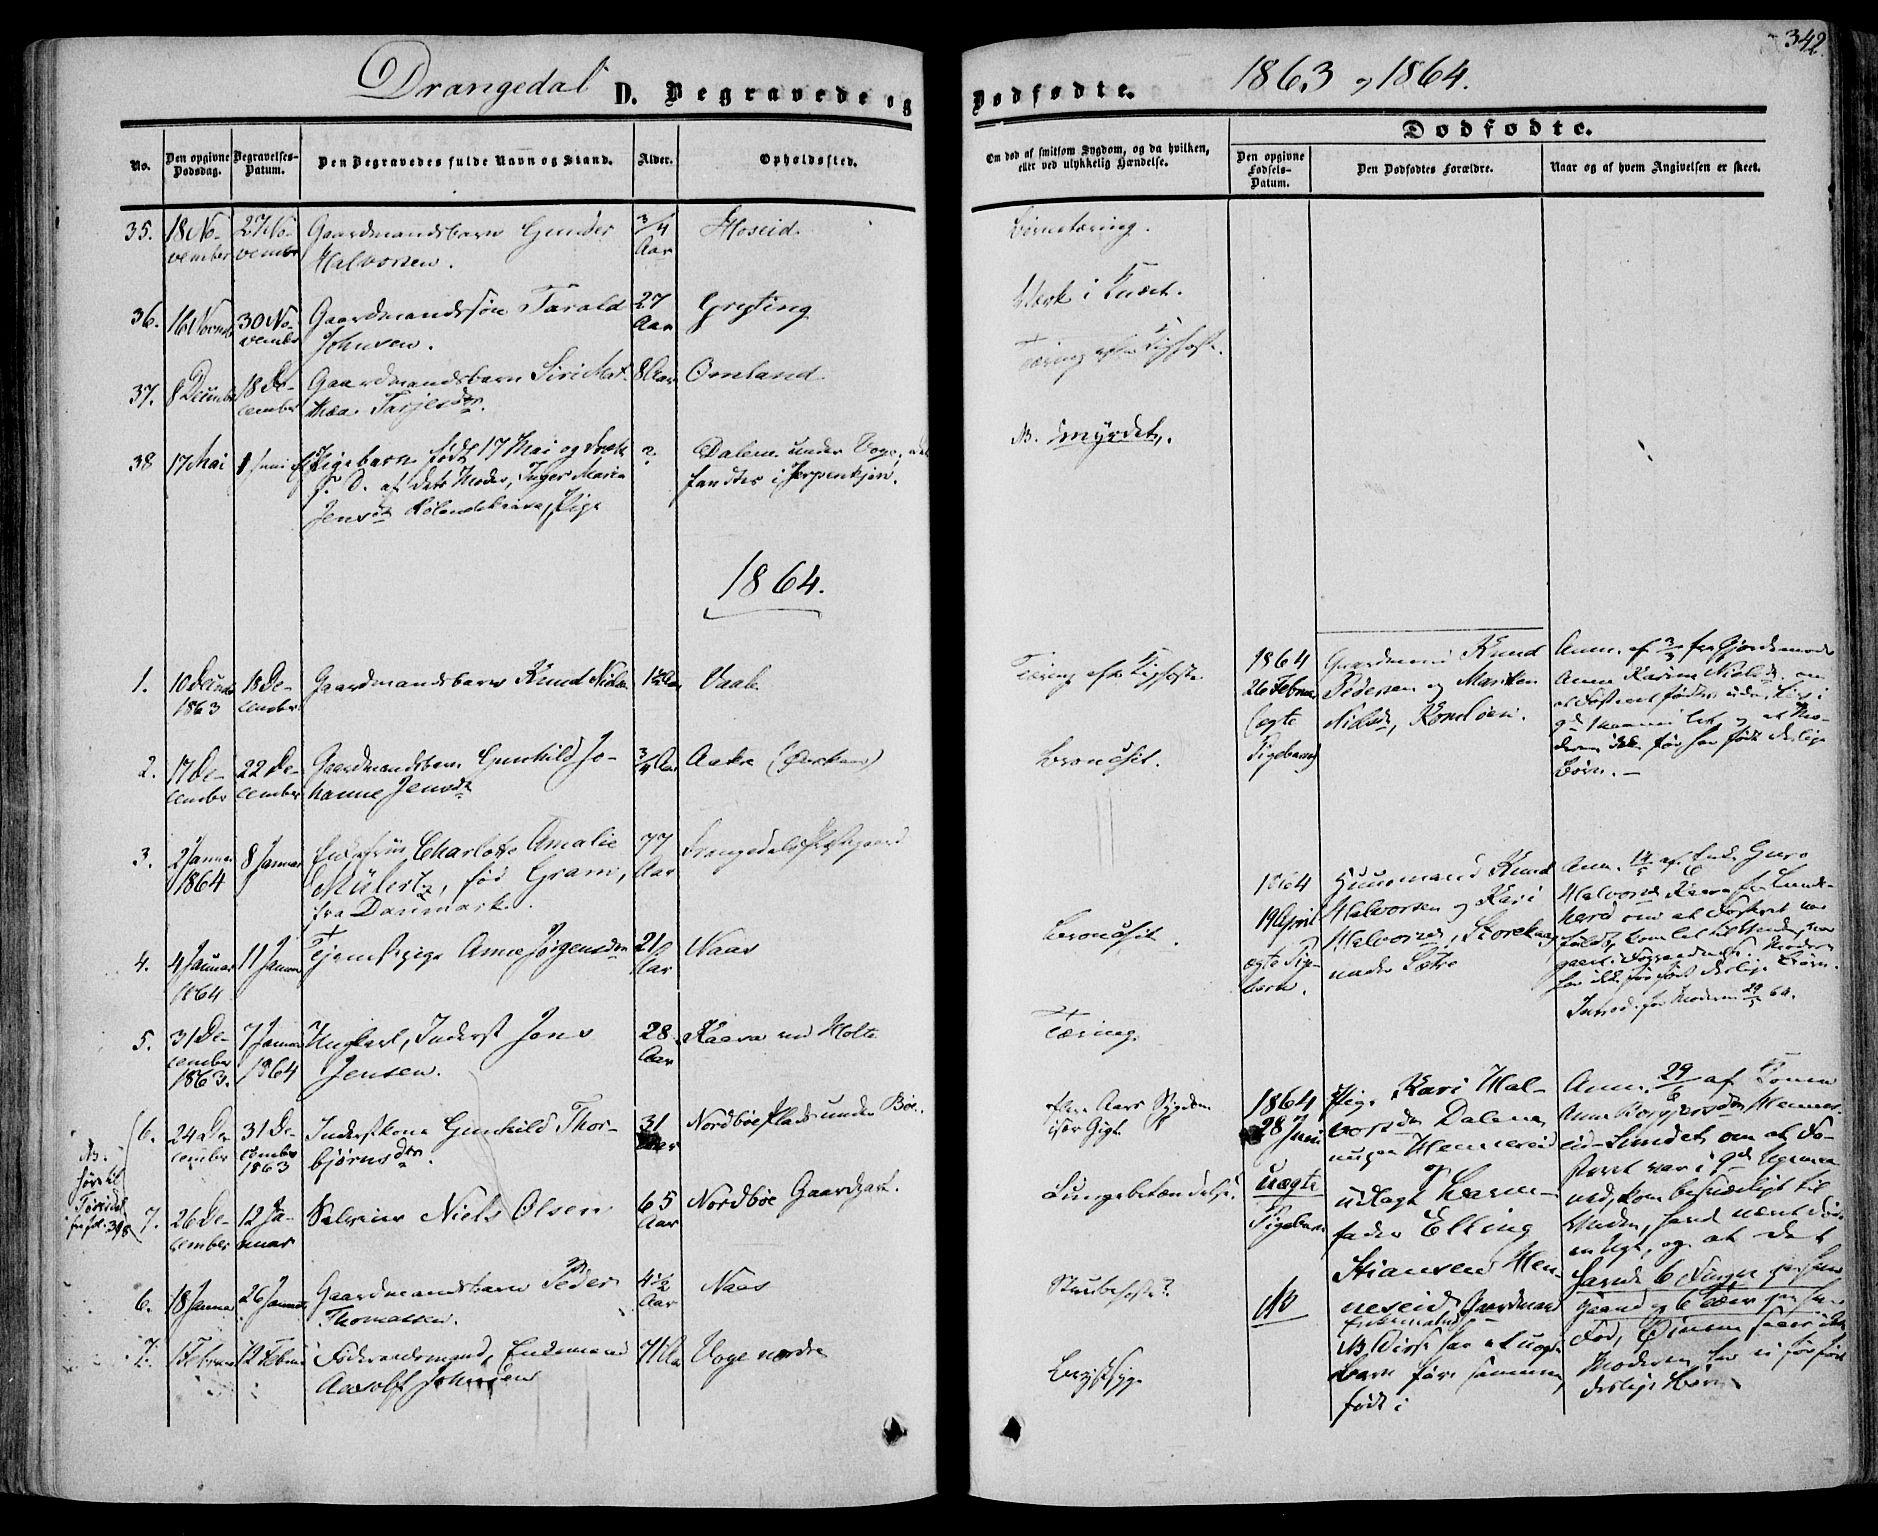 SAKO, Drangedal kirkebøker, F/Fa/L0008: Ministerialbok nr. 8, 1857-1871, s. 342